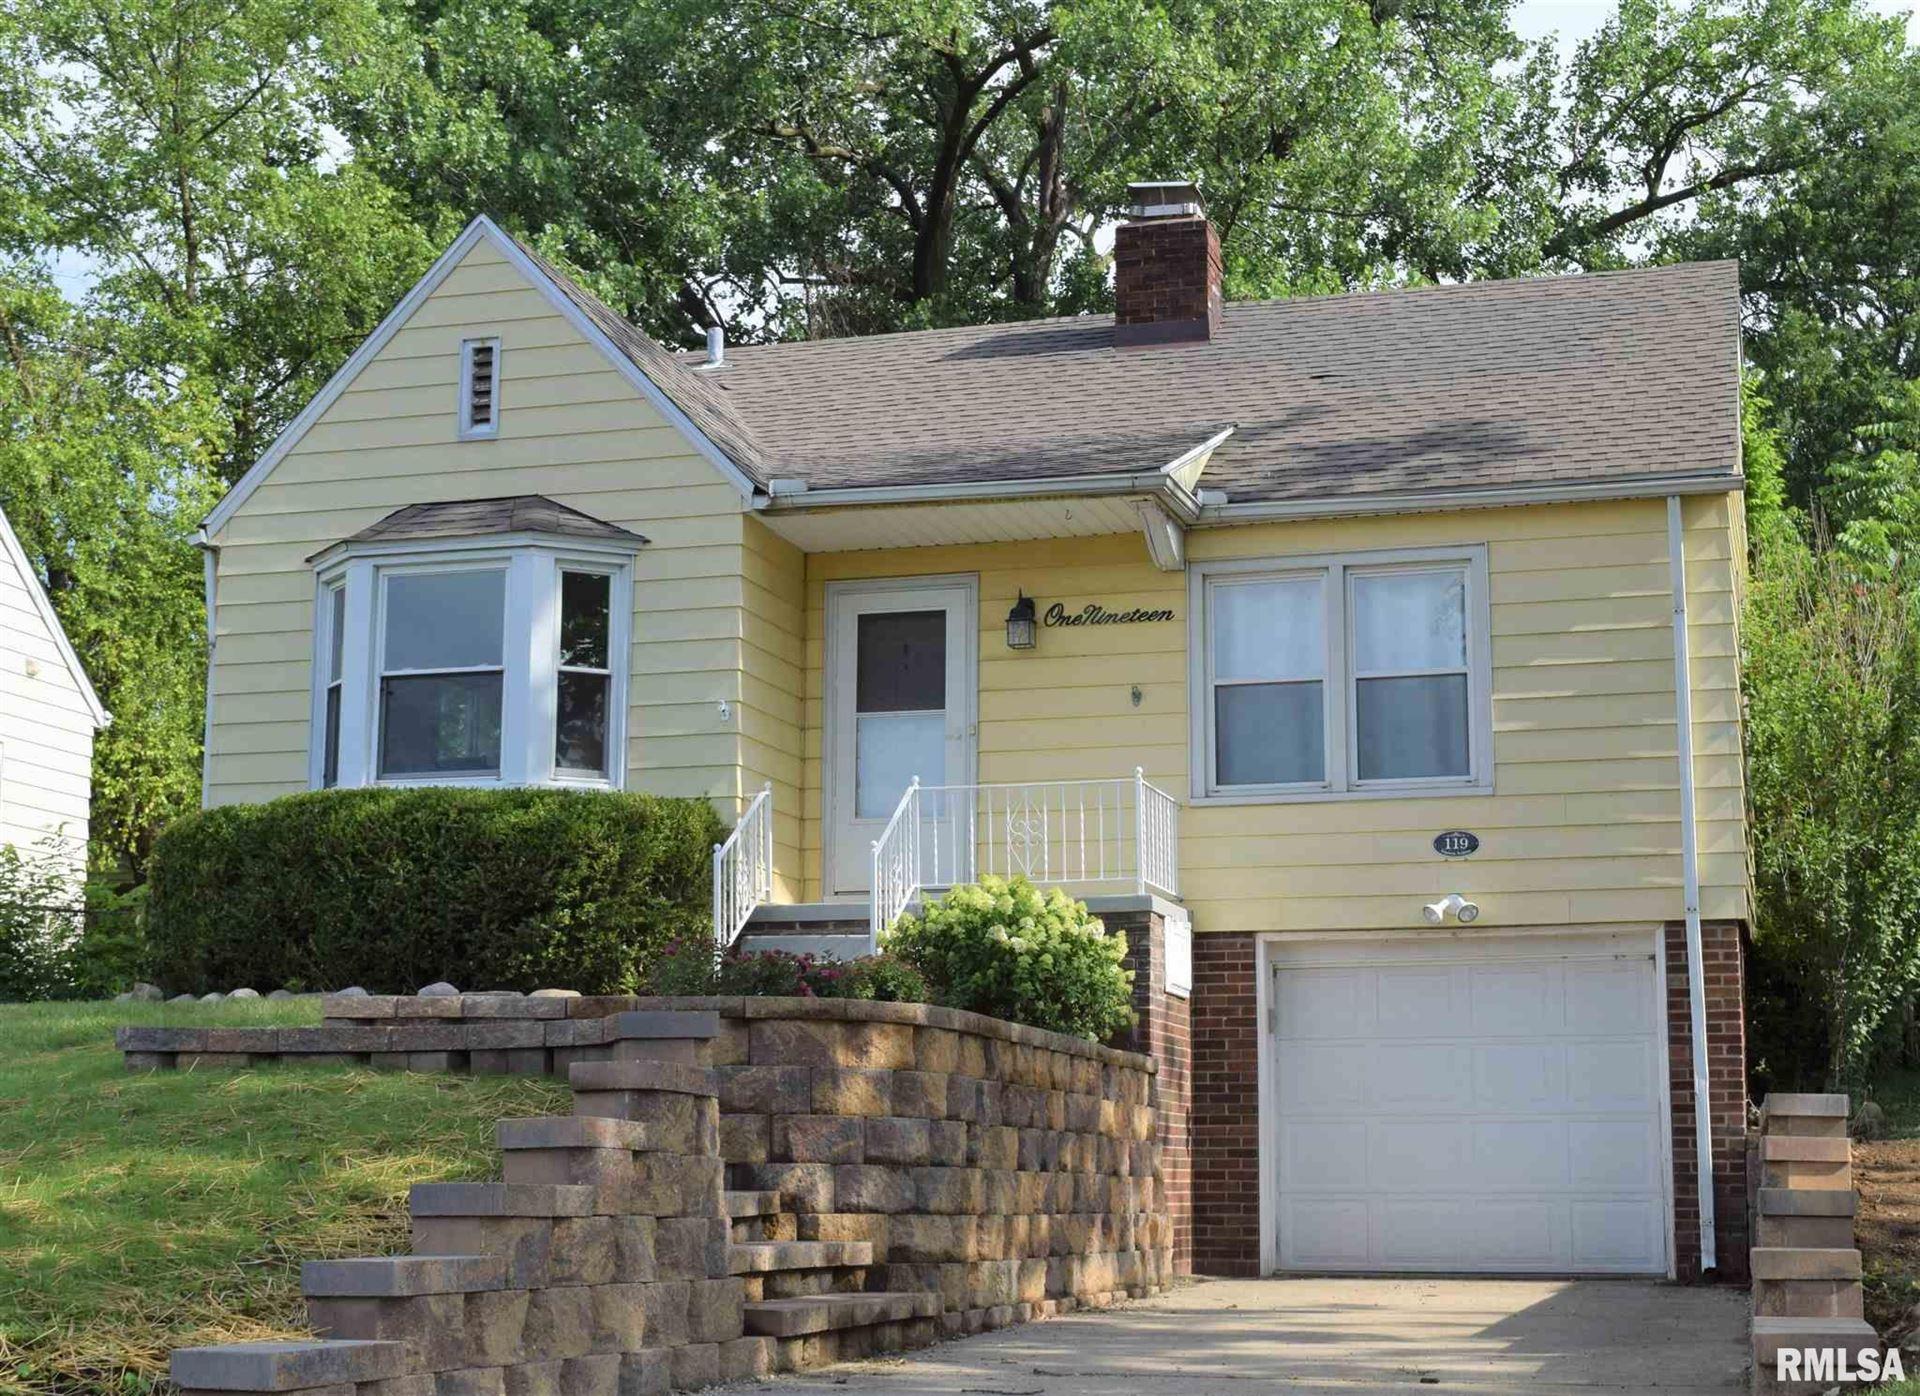 119 E FRANCES Avenue, Peoria, IL 61614 - #: PA1216610